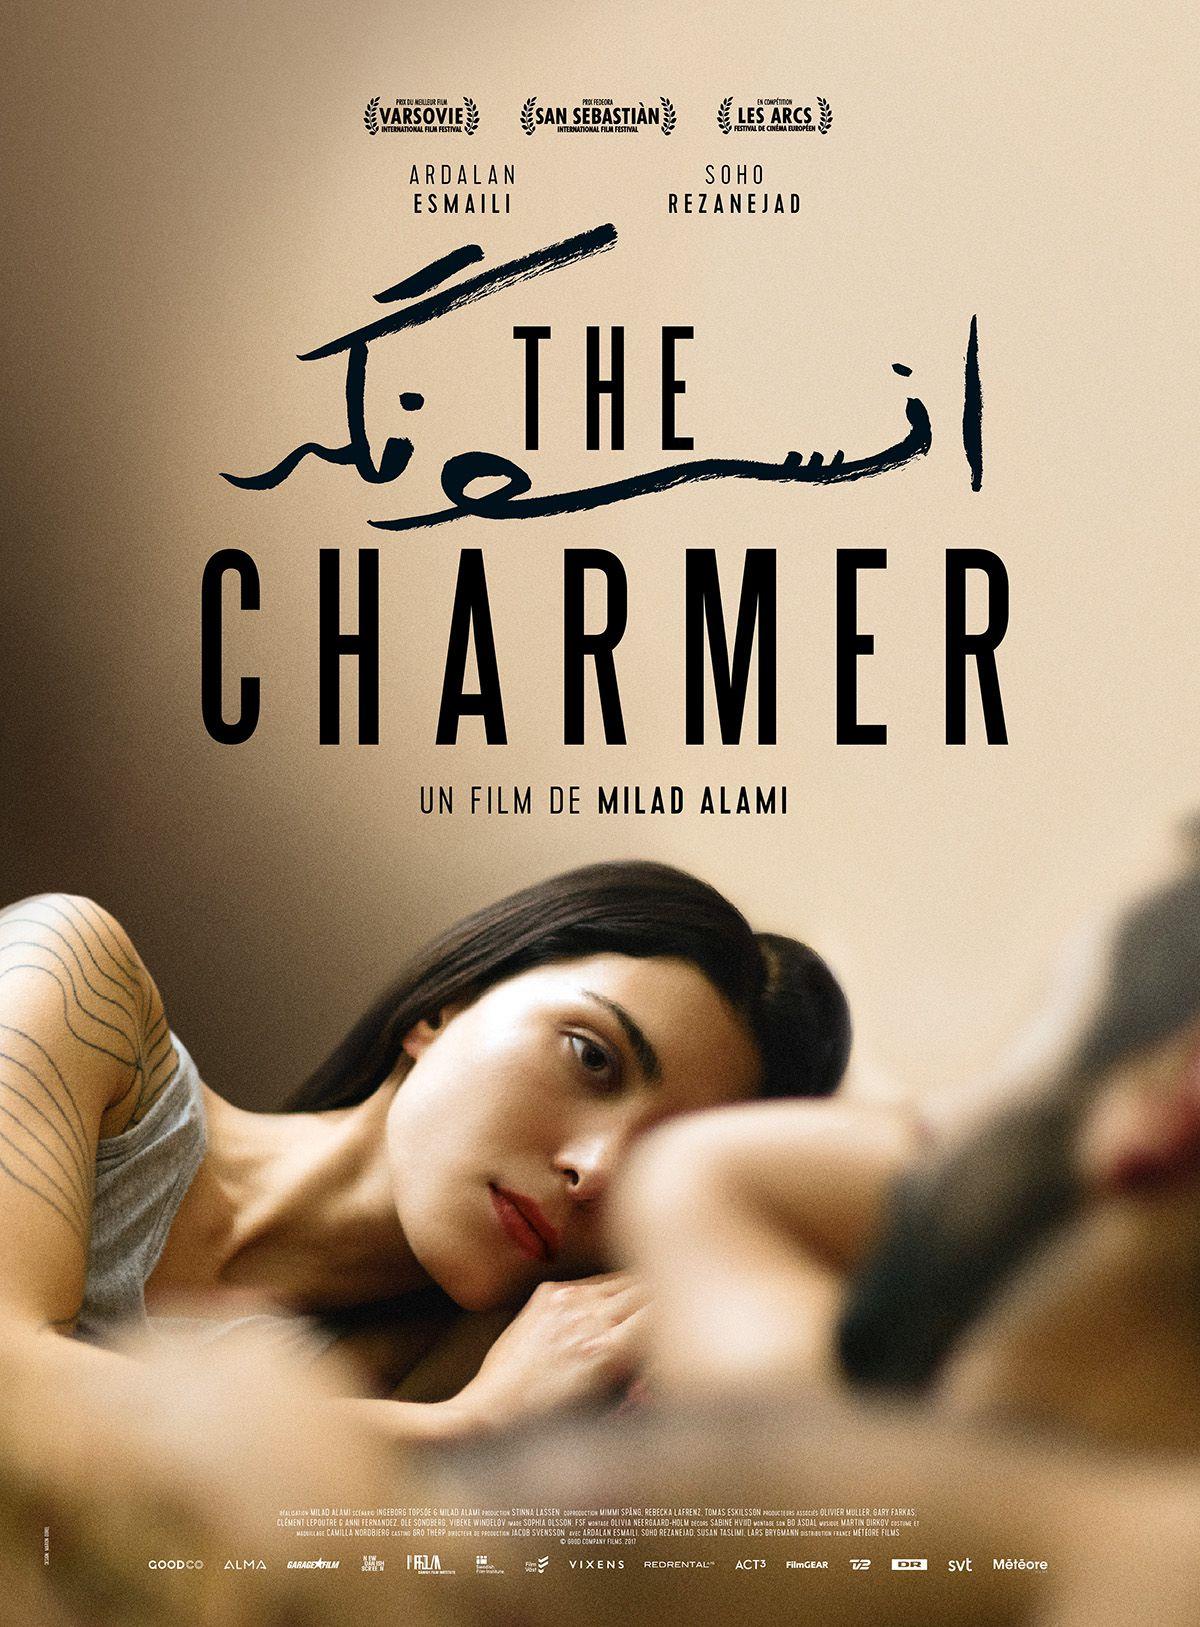 The Charmer - Film (2018)